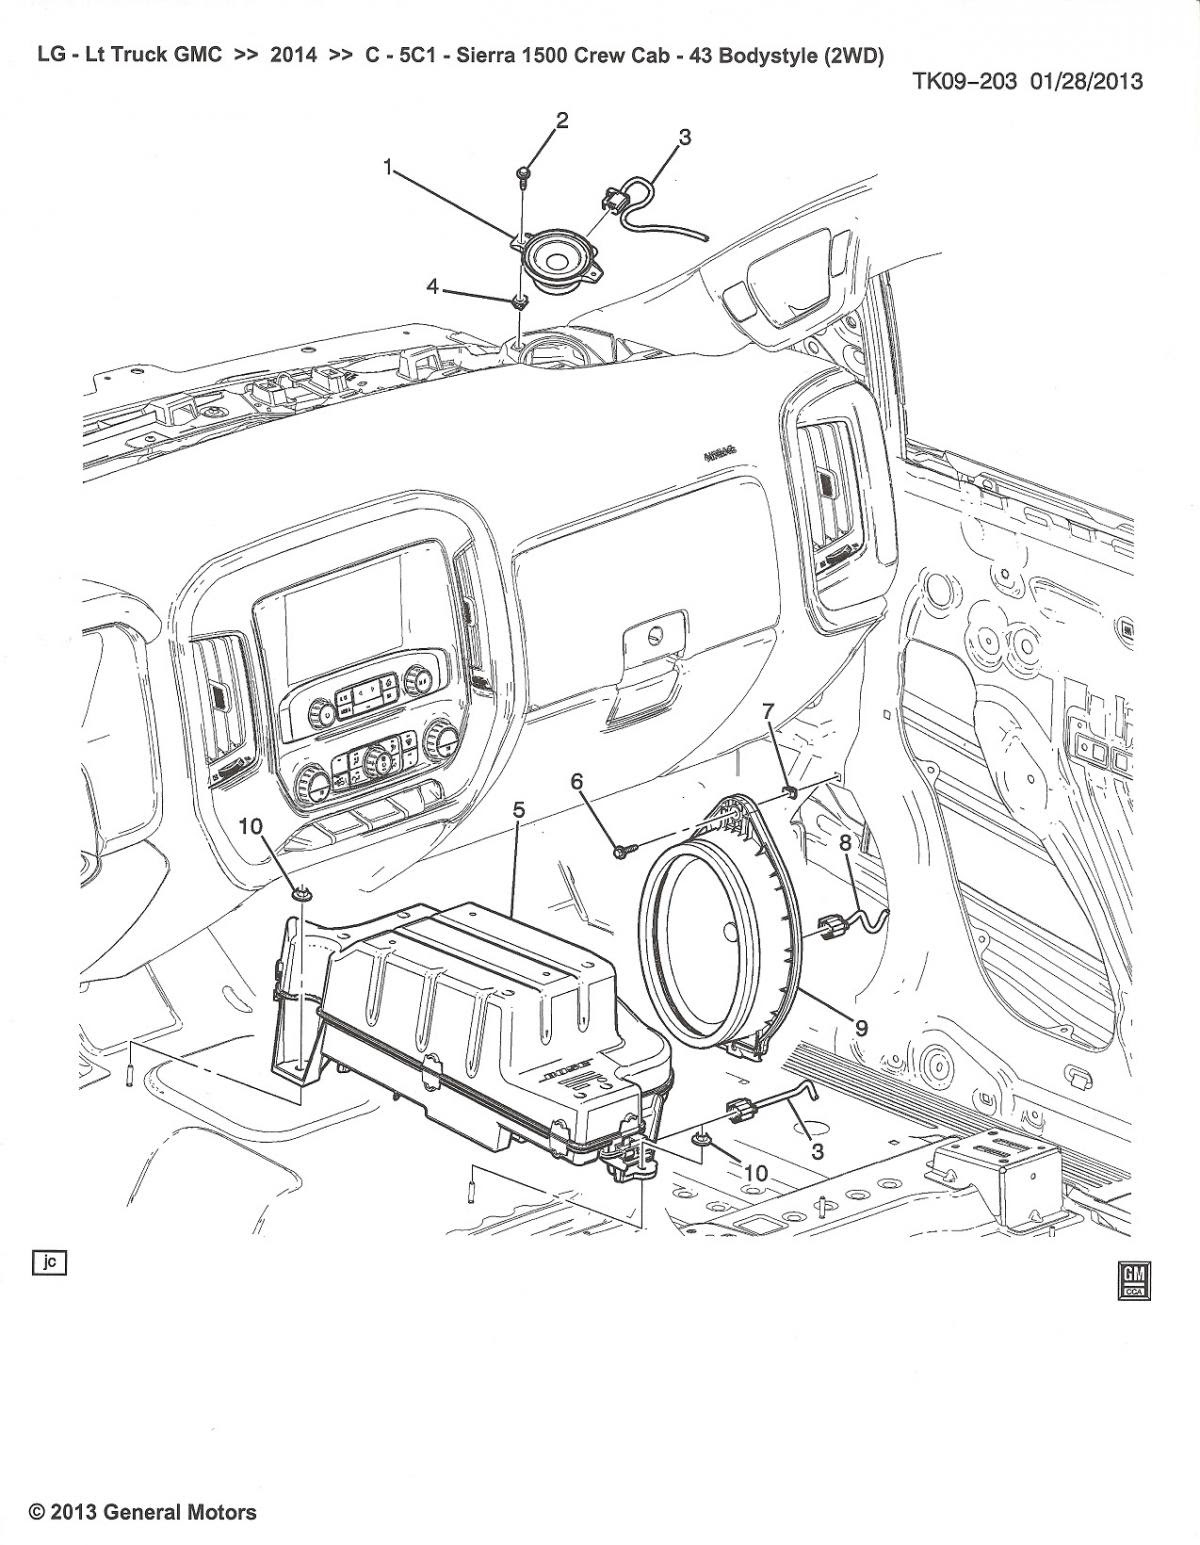 2014 silverado bose speaker wiring diagram 33 2014 silverado radio wiring diagram wiring diagram list  33 2014 silverado radio wiring diagram